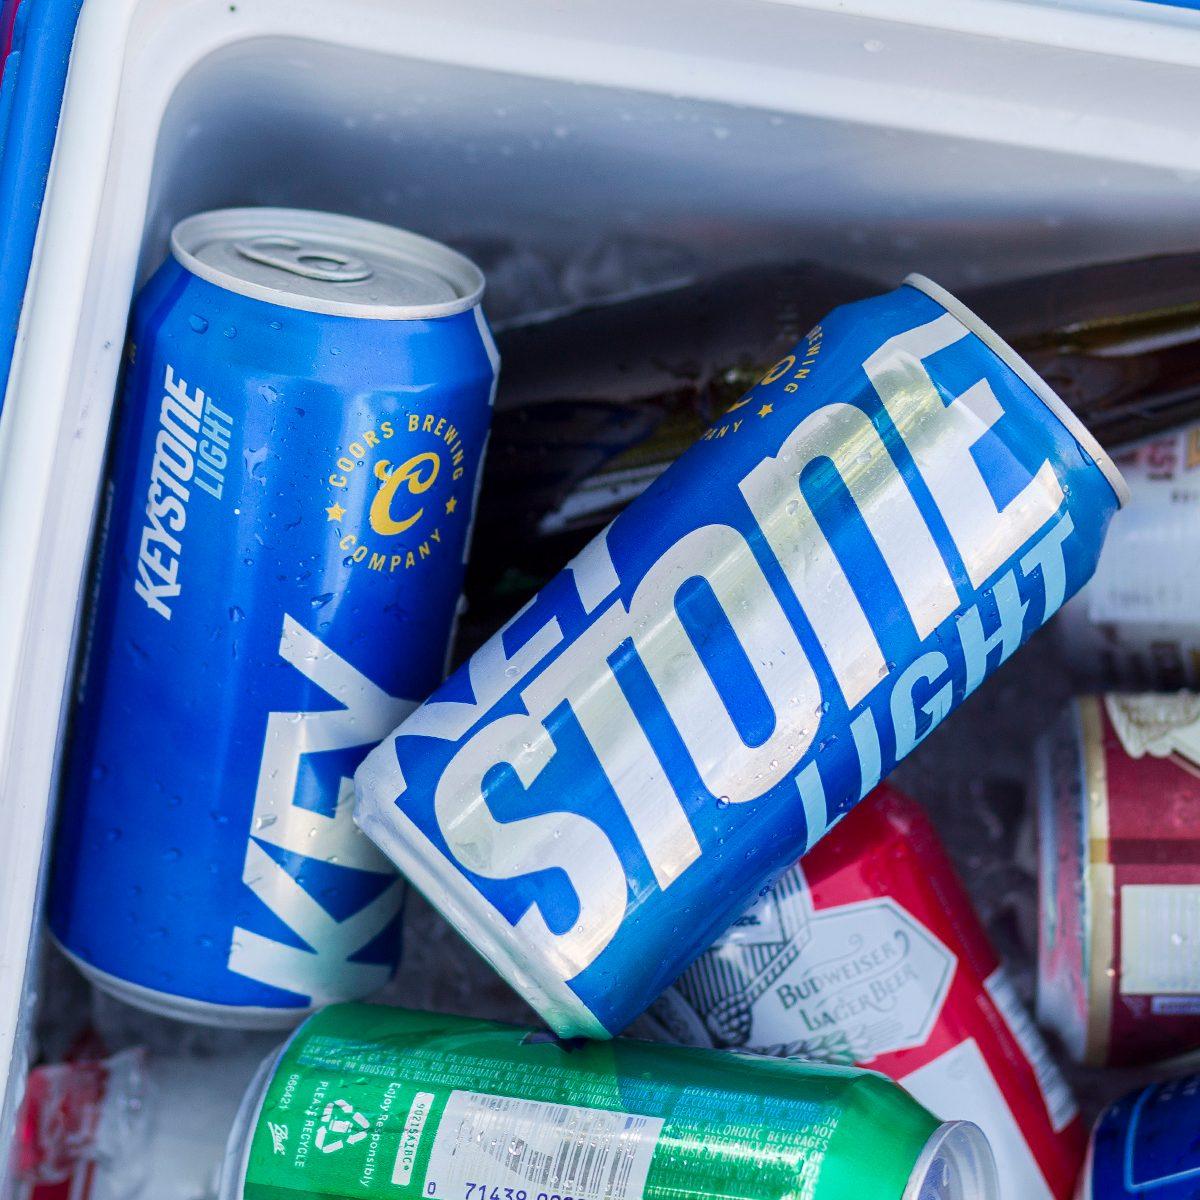 Keystone Light beer in a cooler